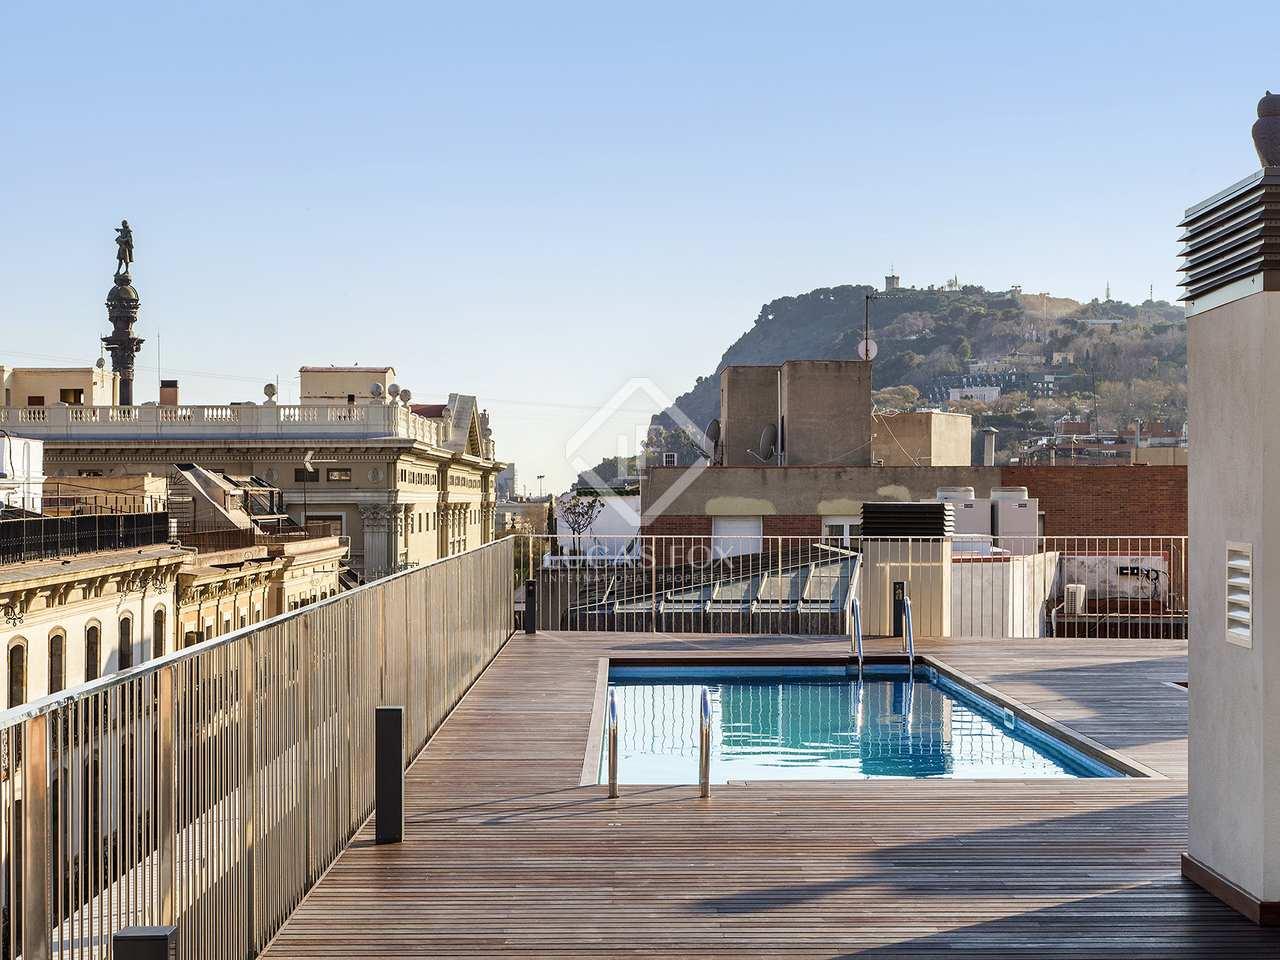 Appartement de 100m a louer g tico barcelone - Appartement de vacances barcelone mesura ...